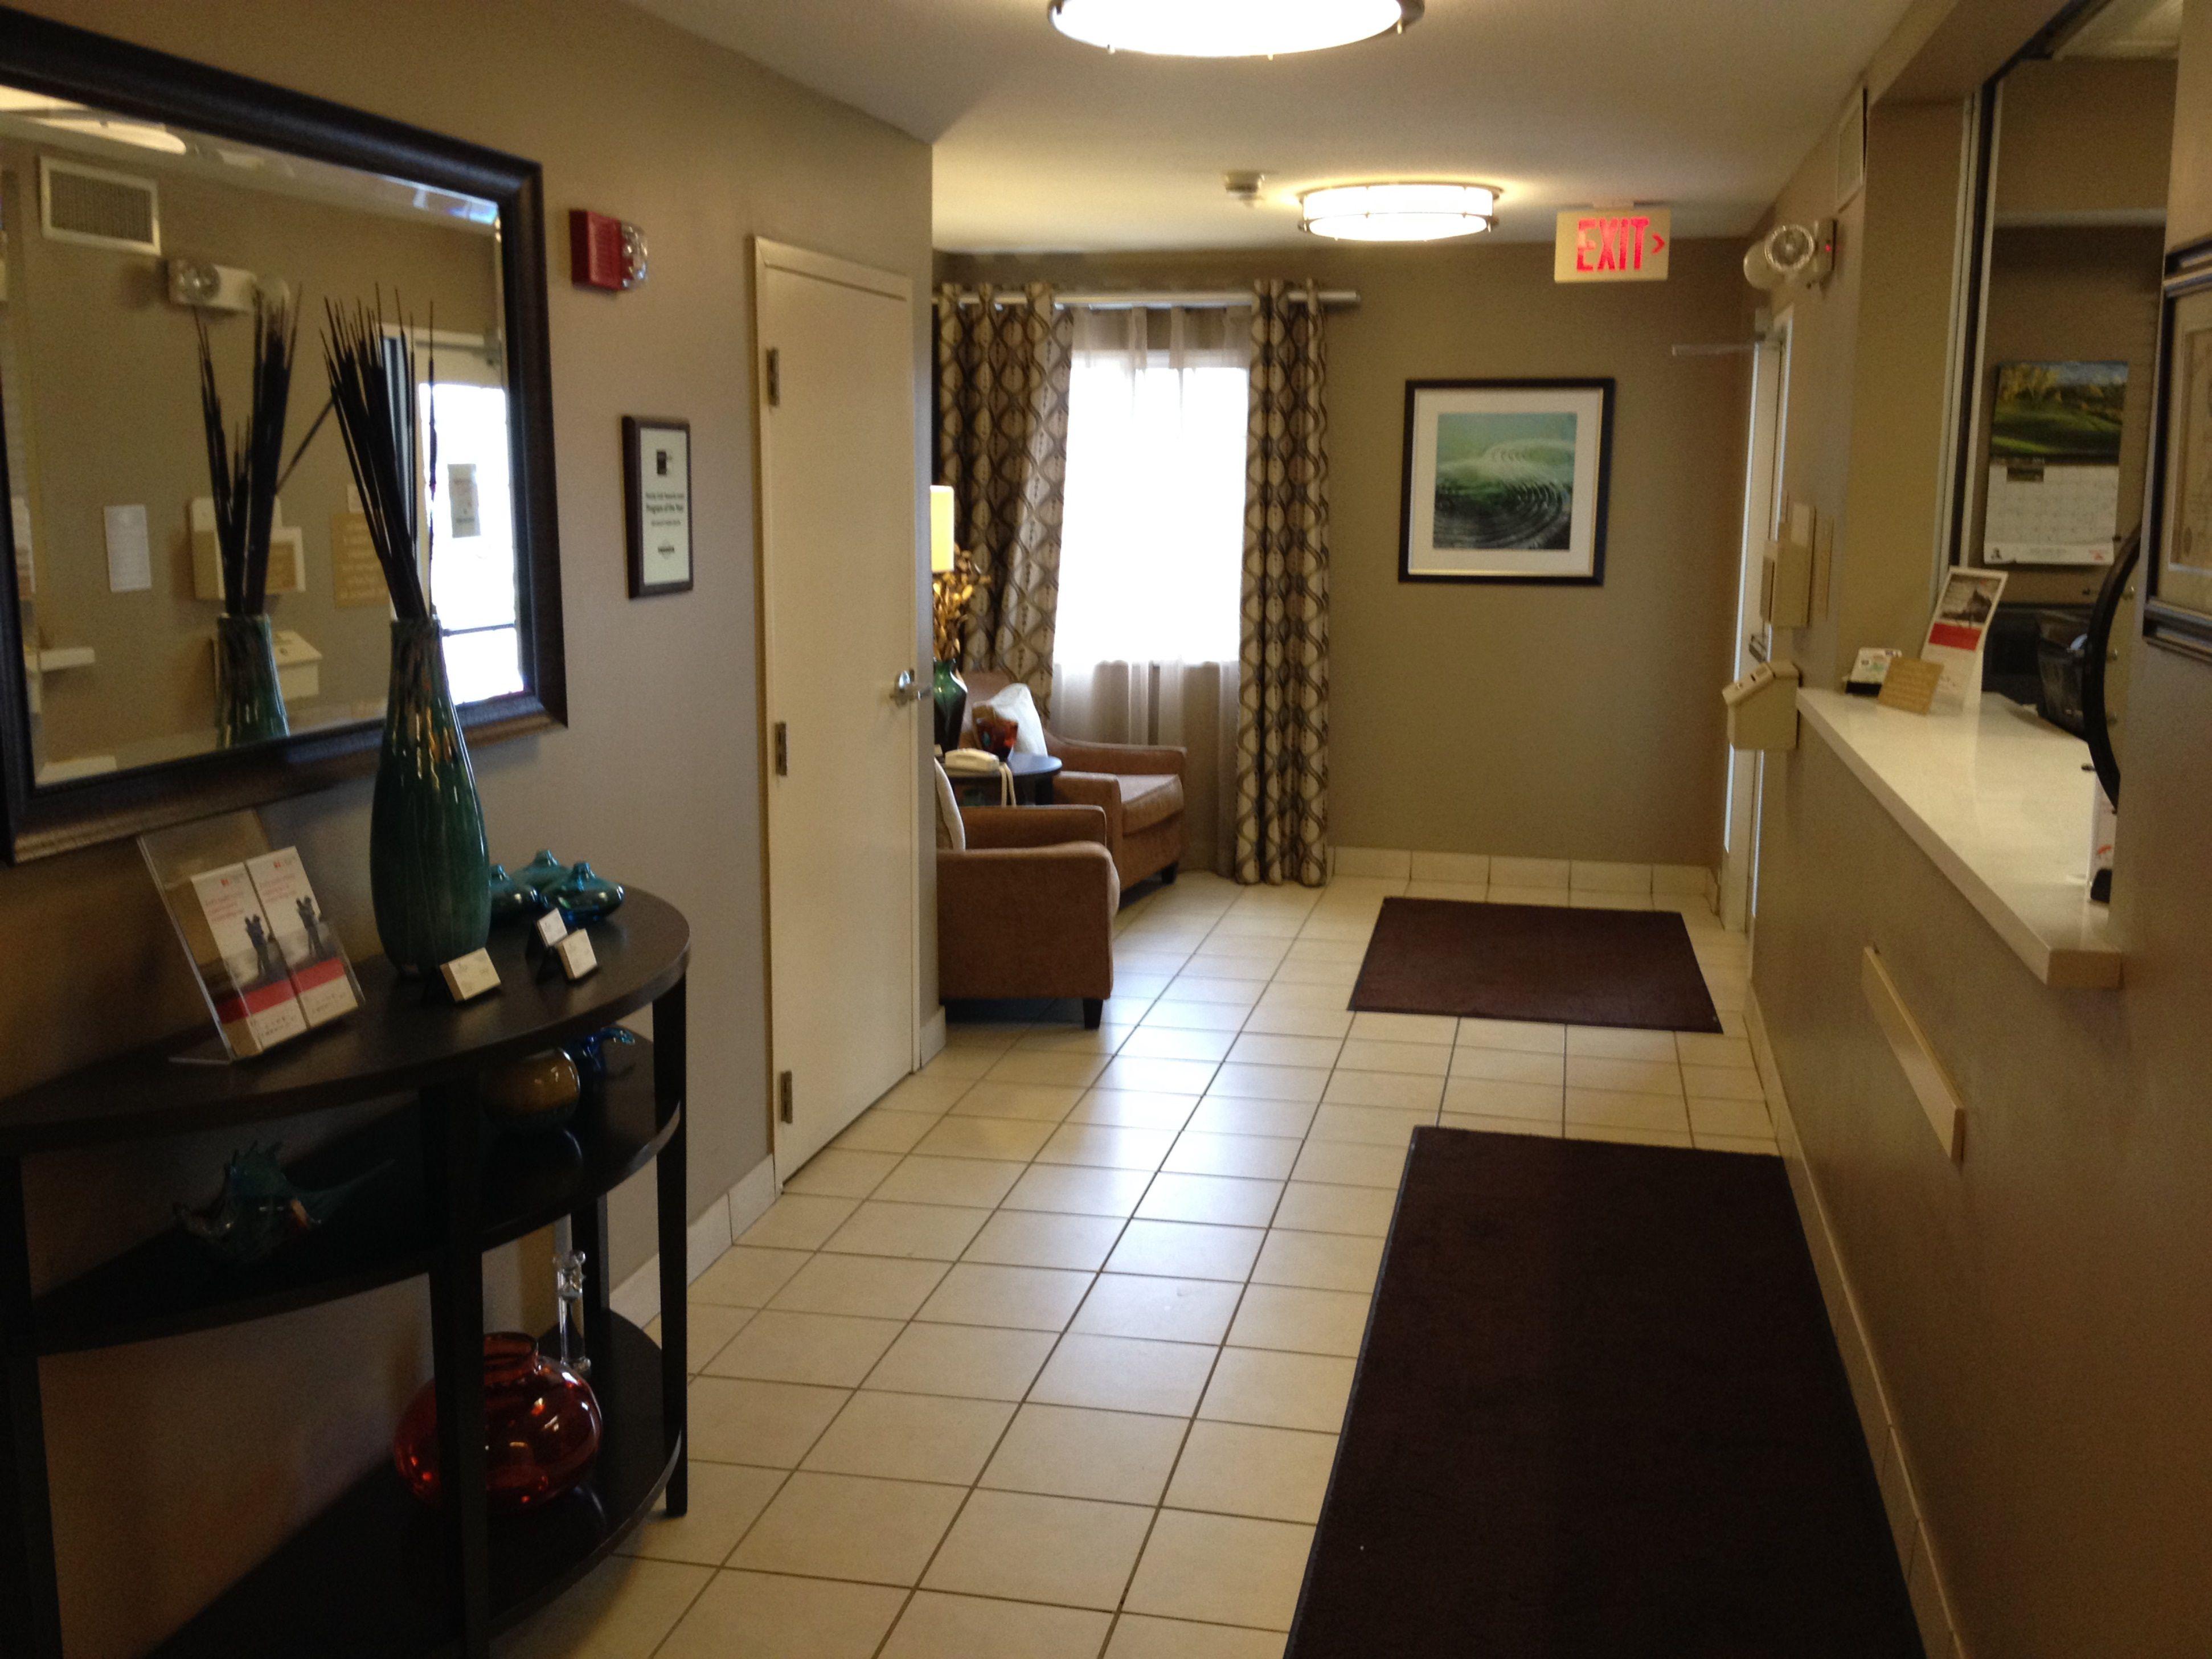 Candlewood suites detroit ann arbor in ann arbor mi 48103 for V kitchen ann arbor